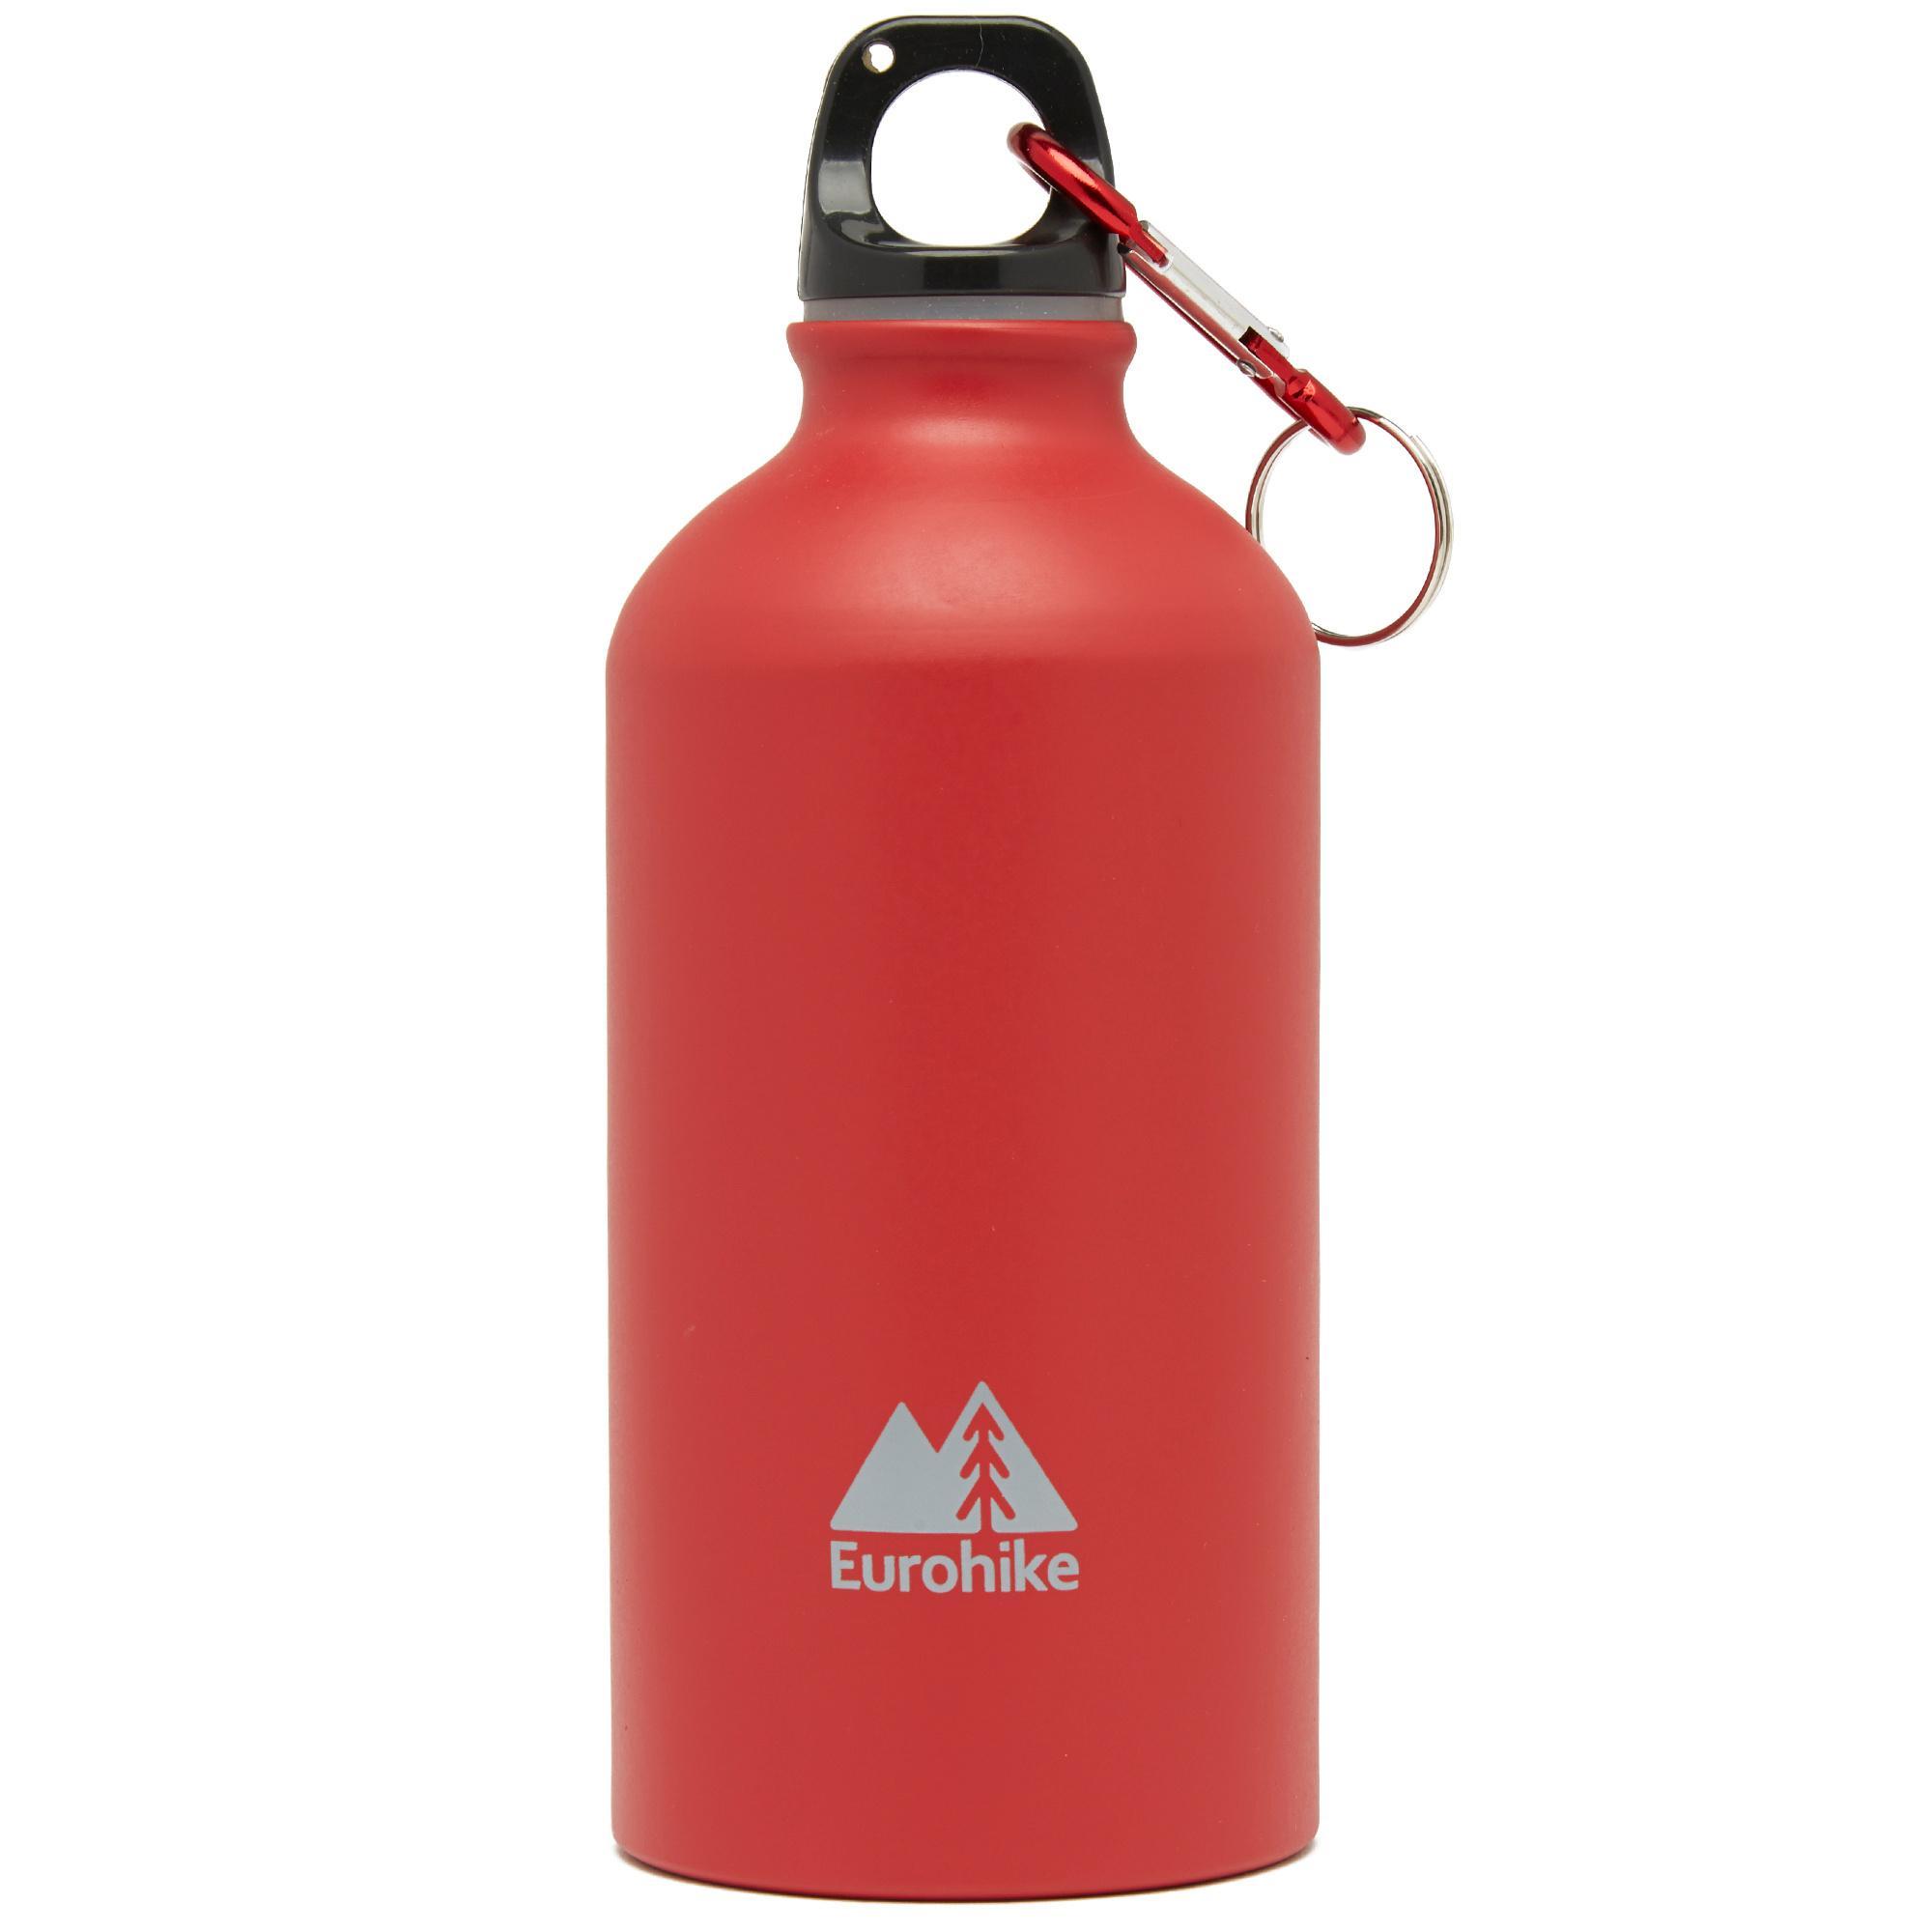 Eurohike Aqua 0.5L Aluminium Water Bottle, RED/RED